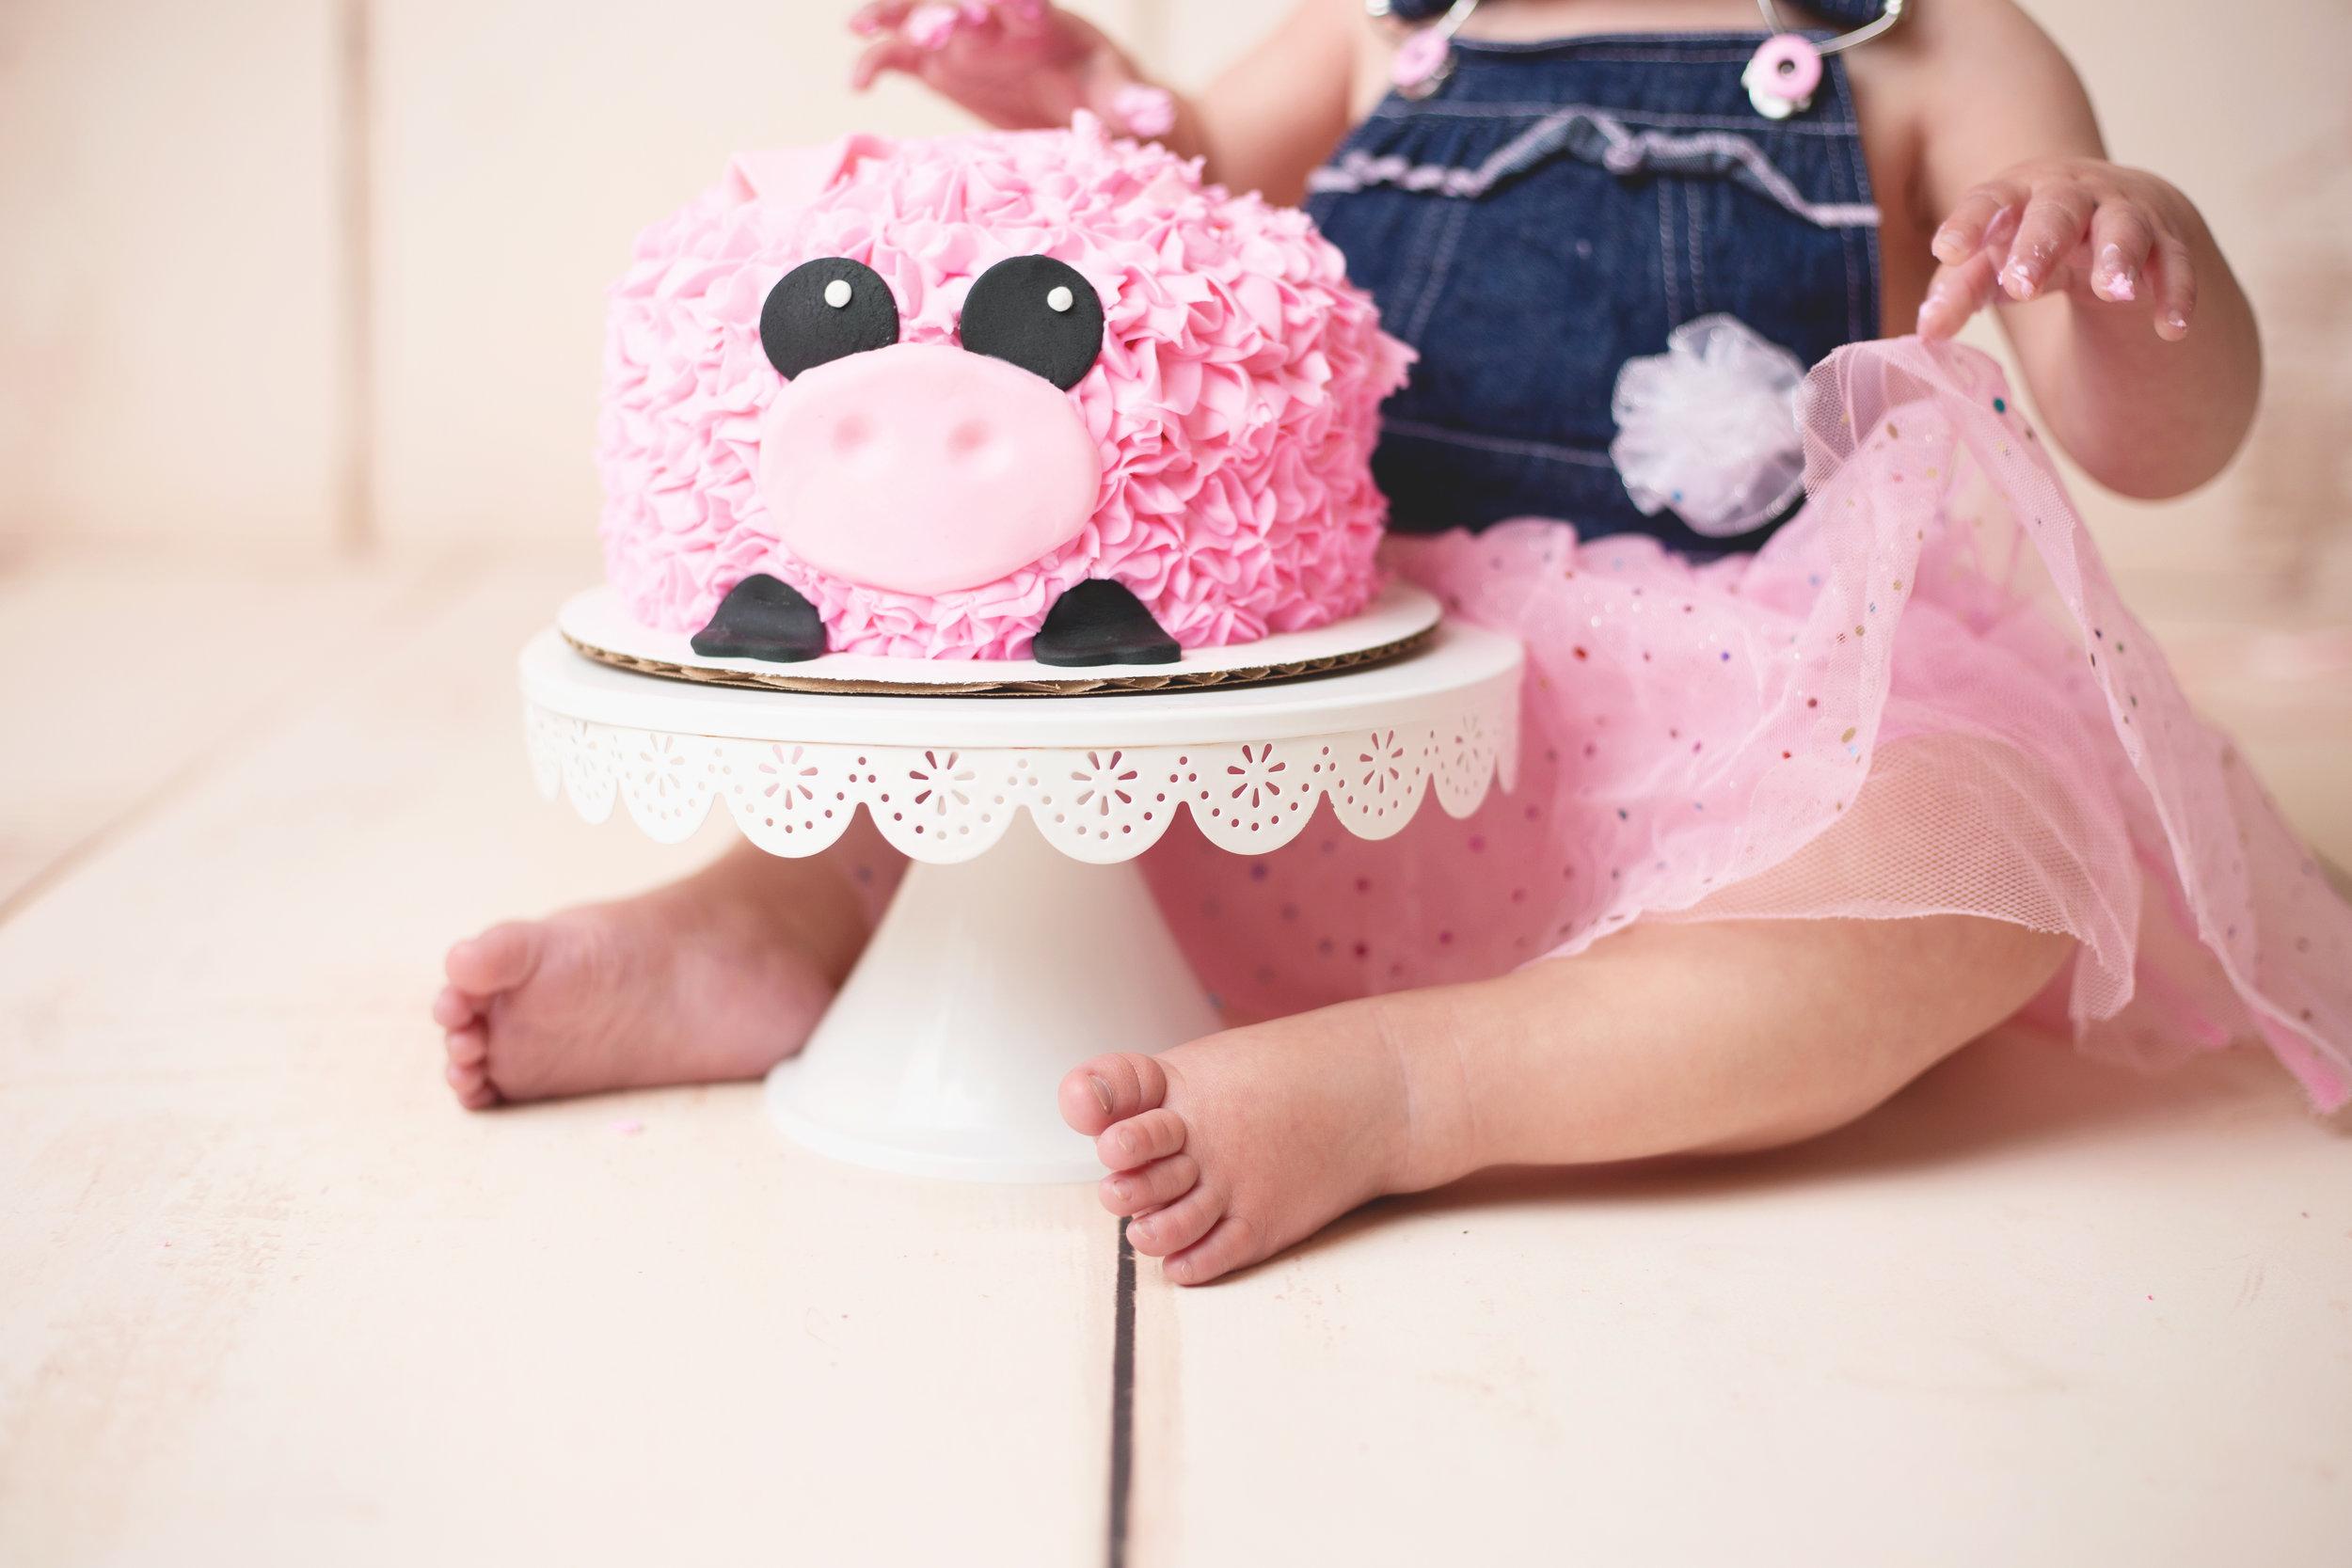 anchorage-cake-smash-photographer-3.jpg